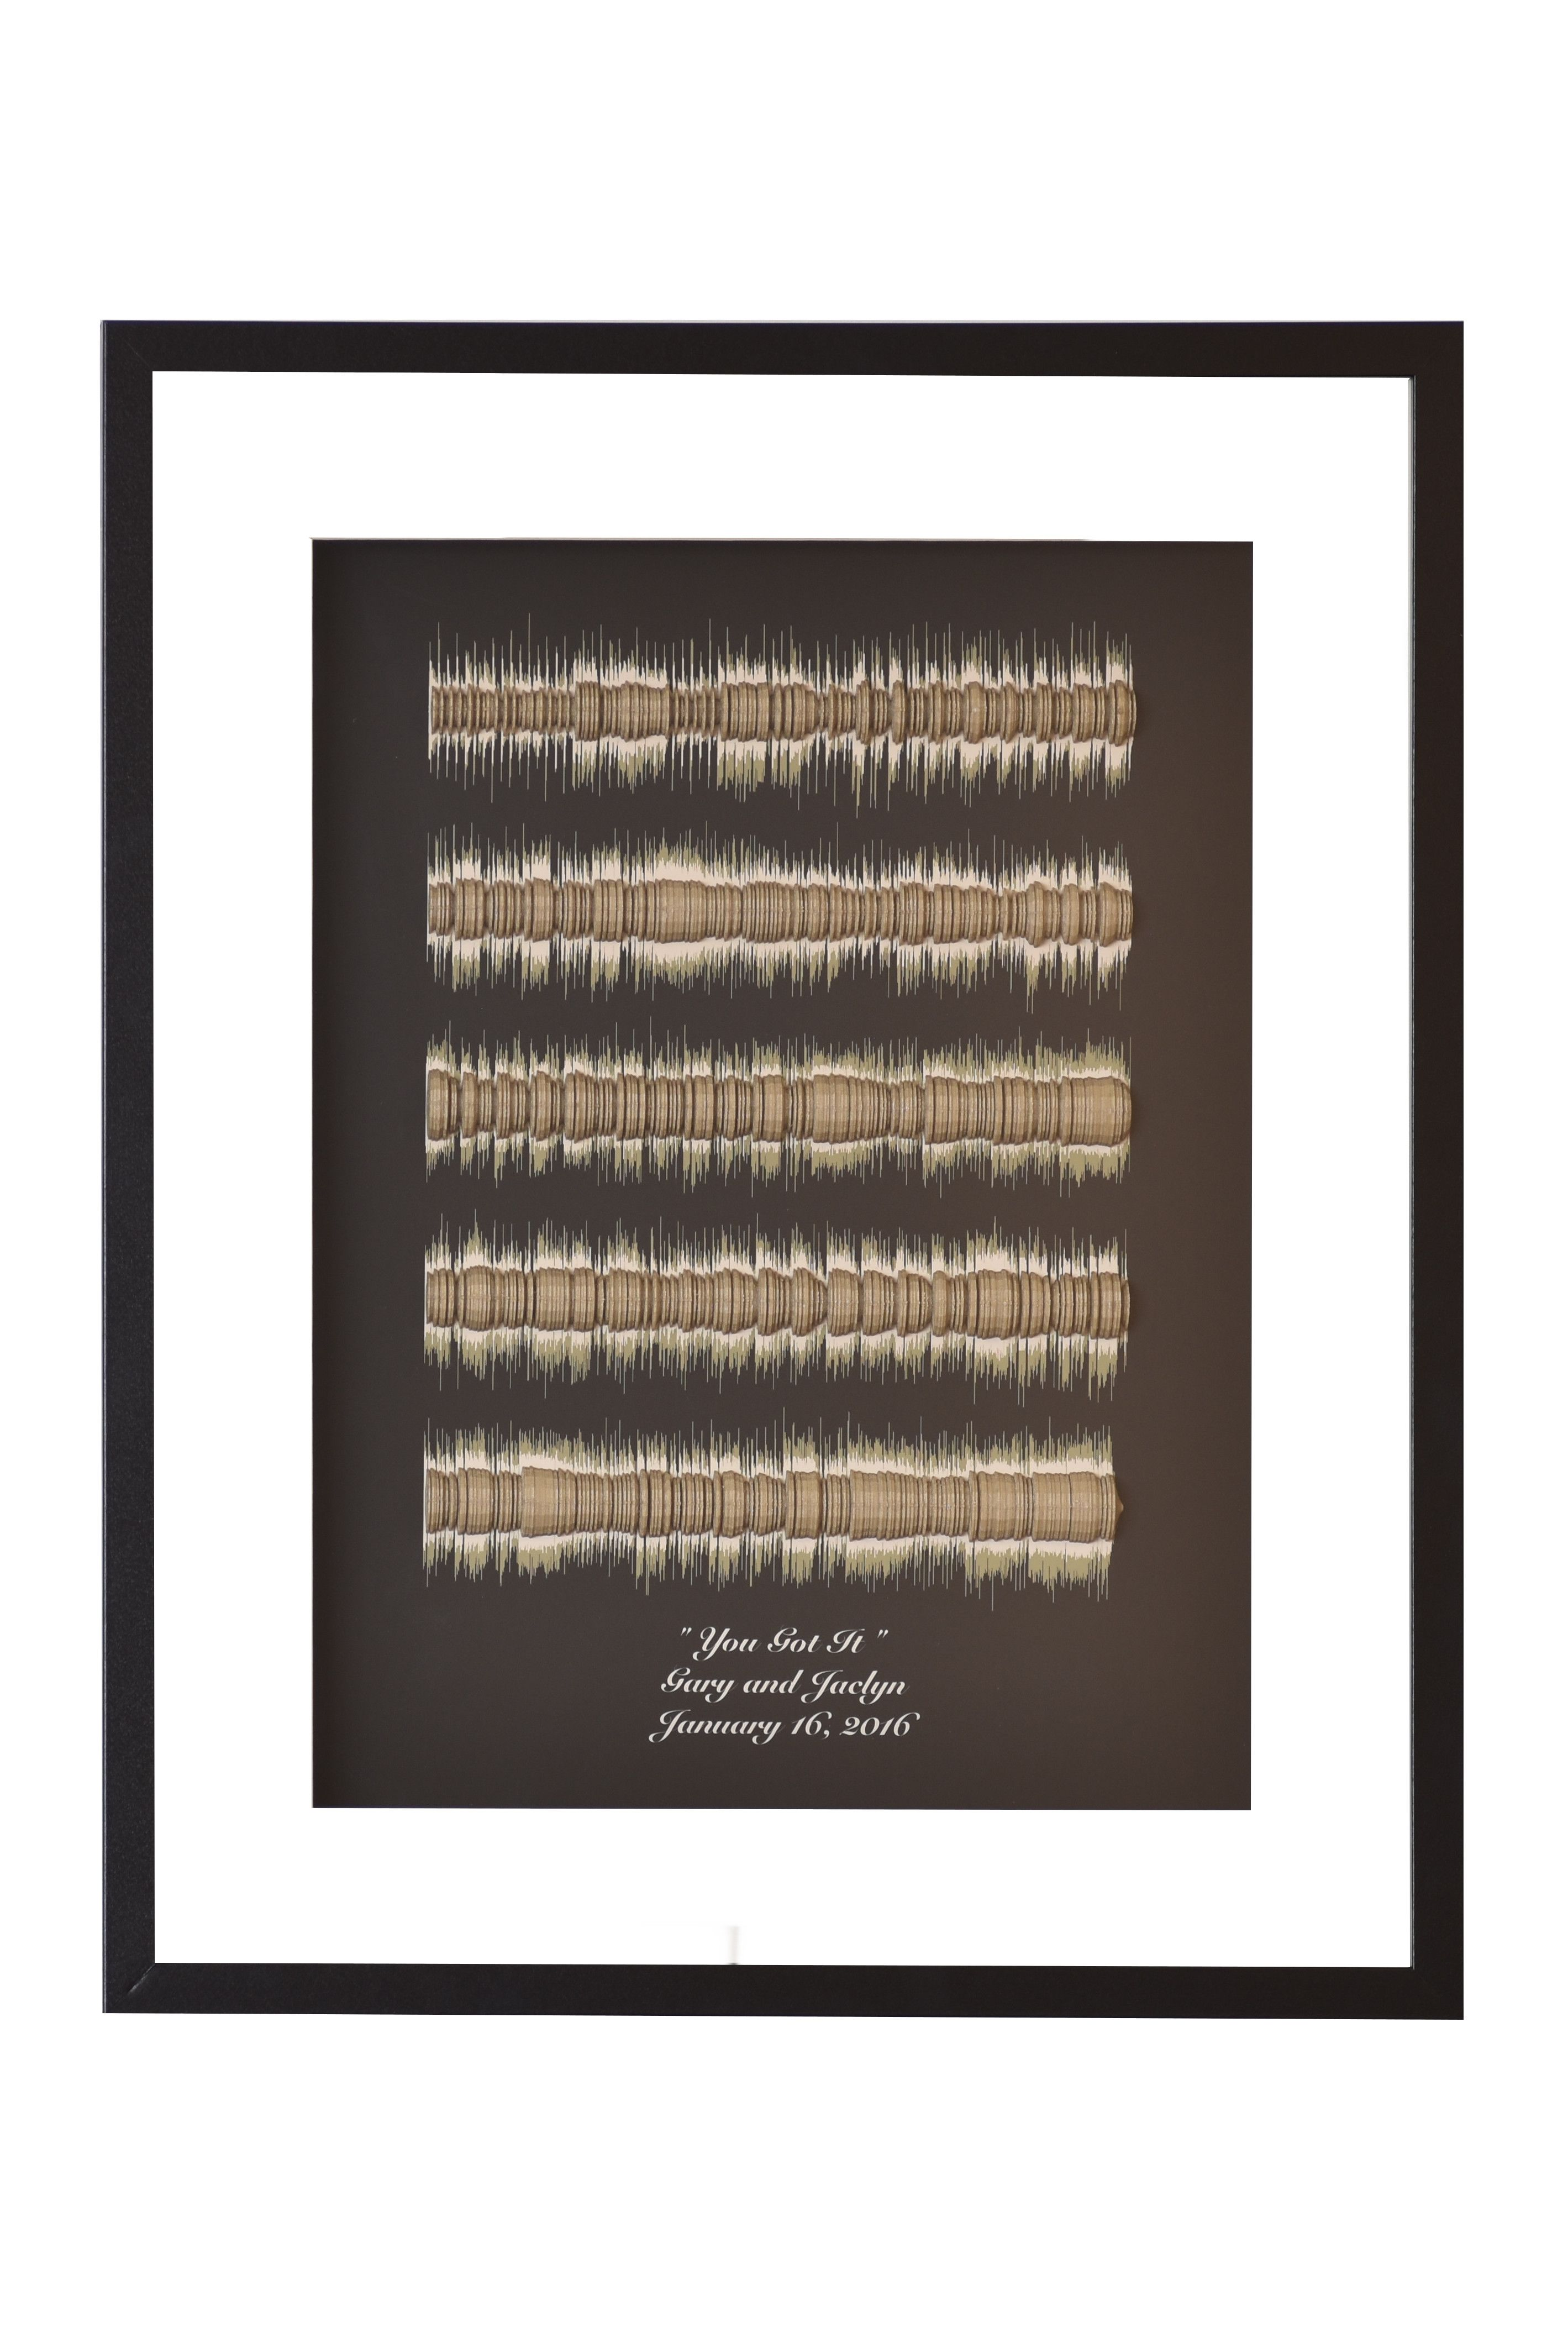 Buy A Custom Made Song Lyrics 3d Sound Wave Art Wedding Song